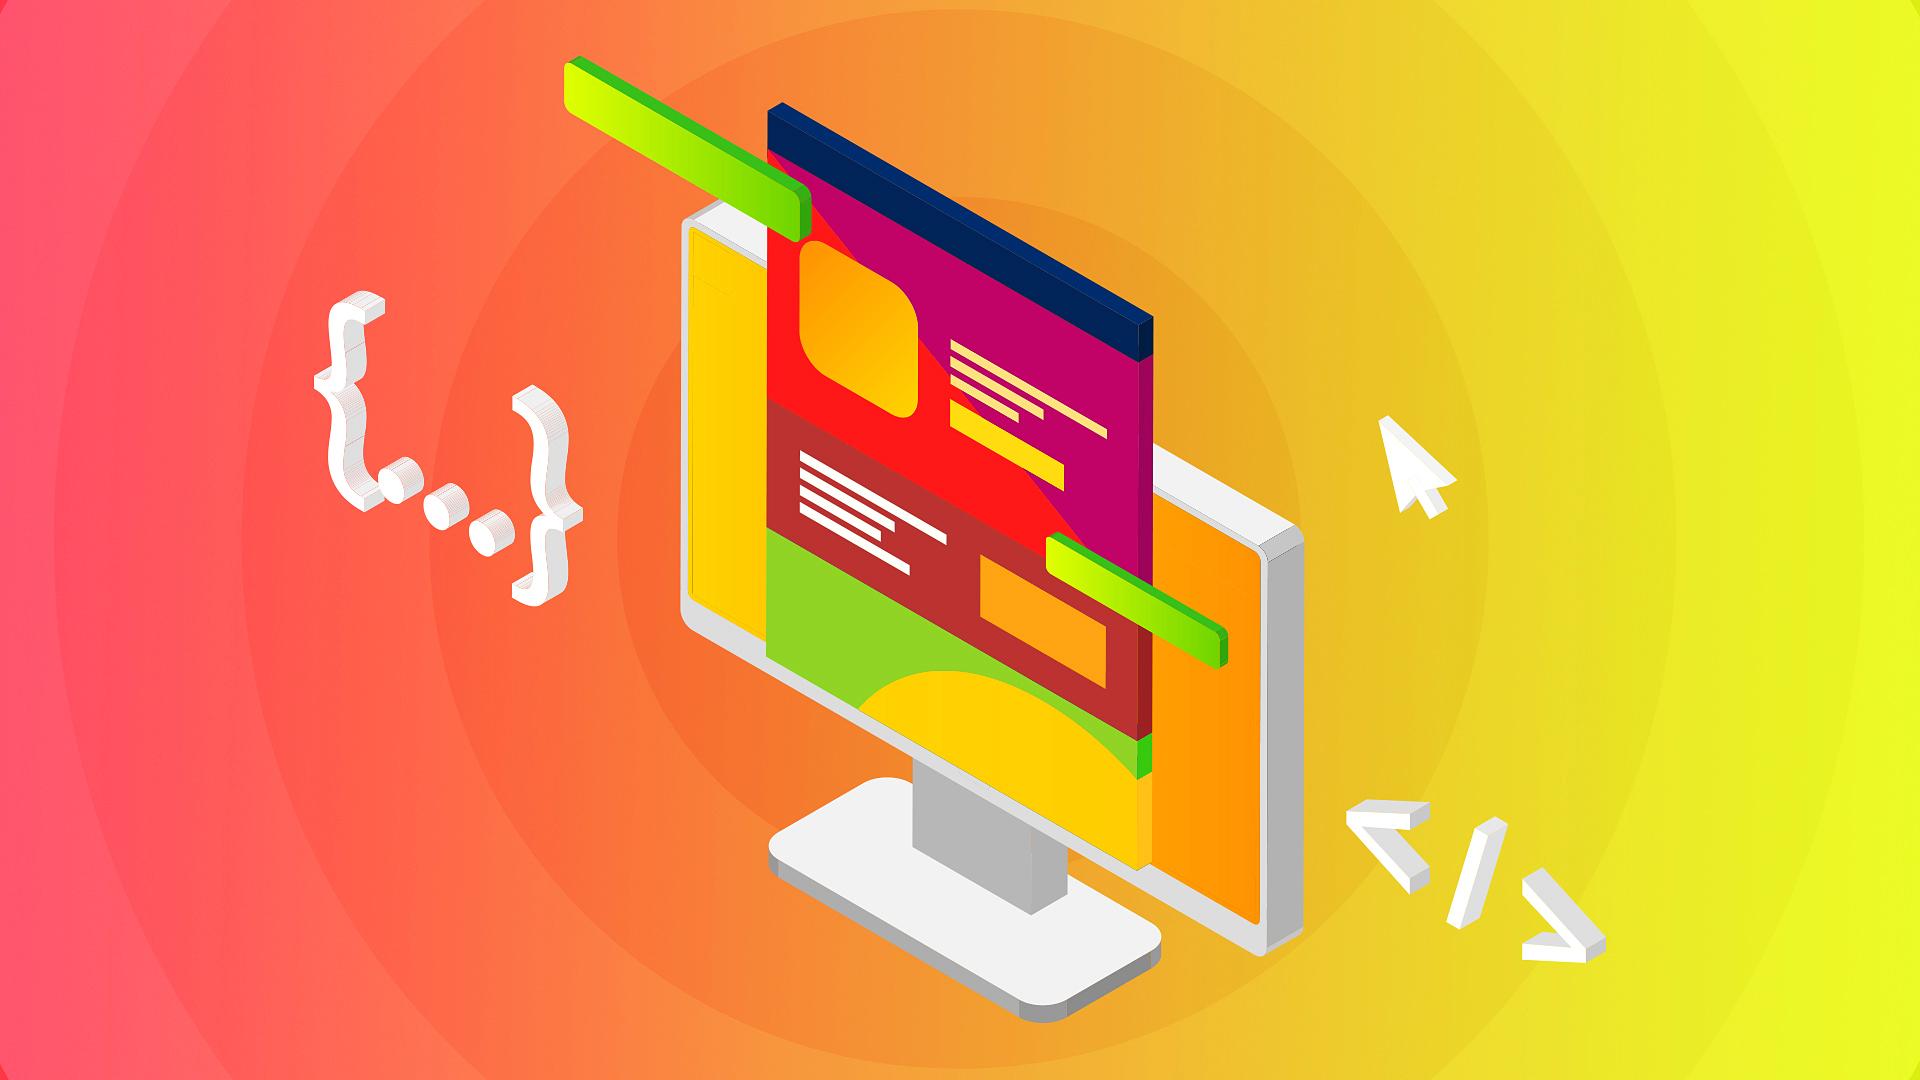 Вебинар Научись программировать сайт за 1 час фото